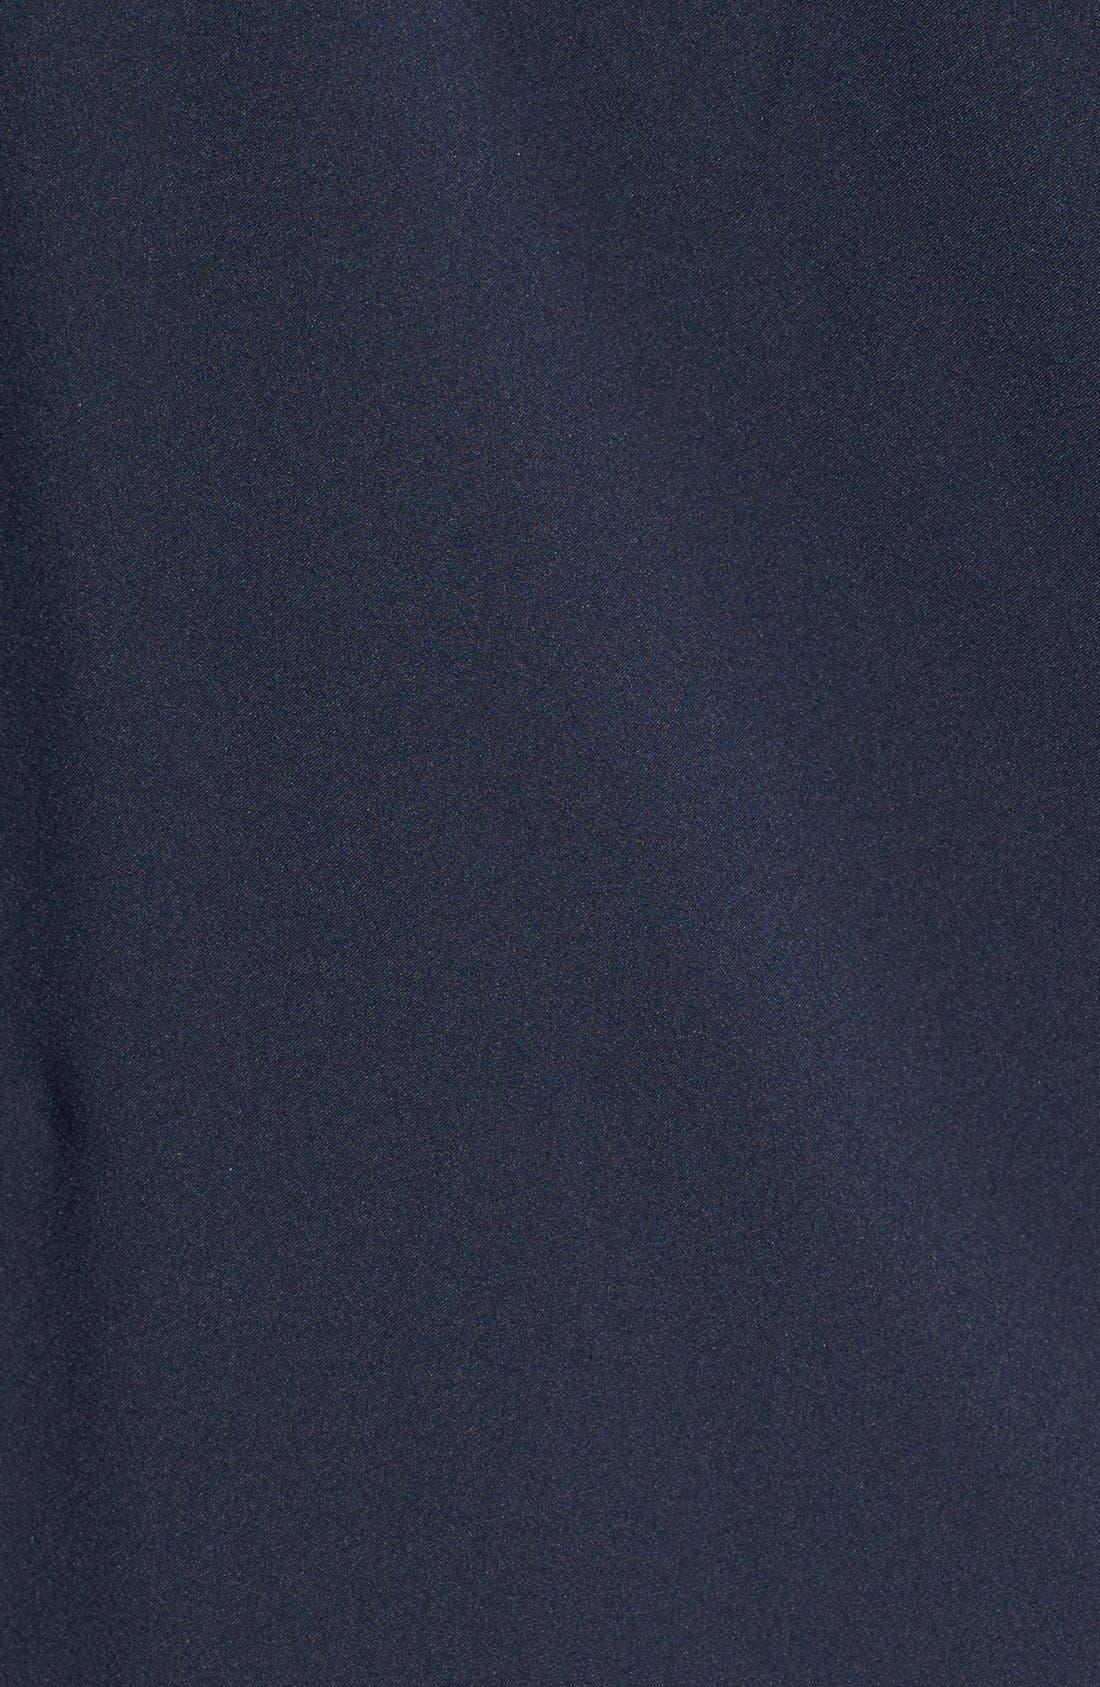 Alternate Image 3  - Cutter & Buck 'WeatherTec Sanders' Jacket (Online Only)